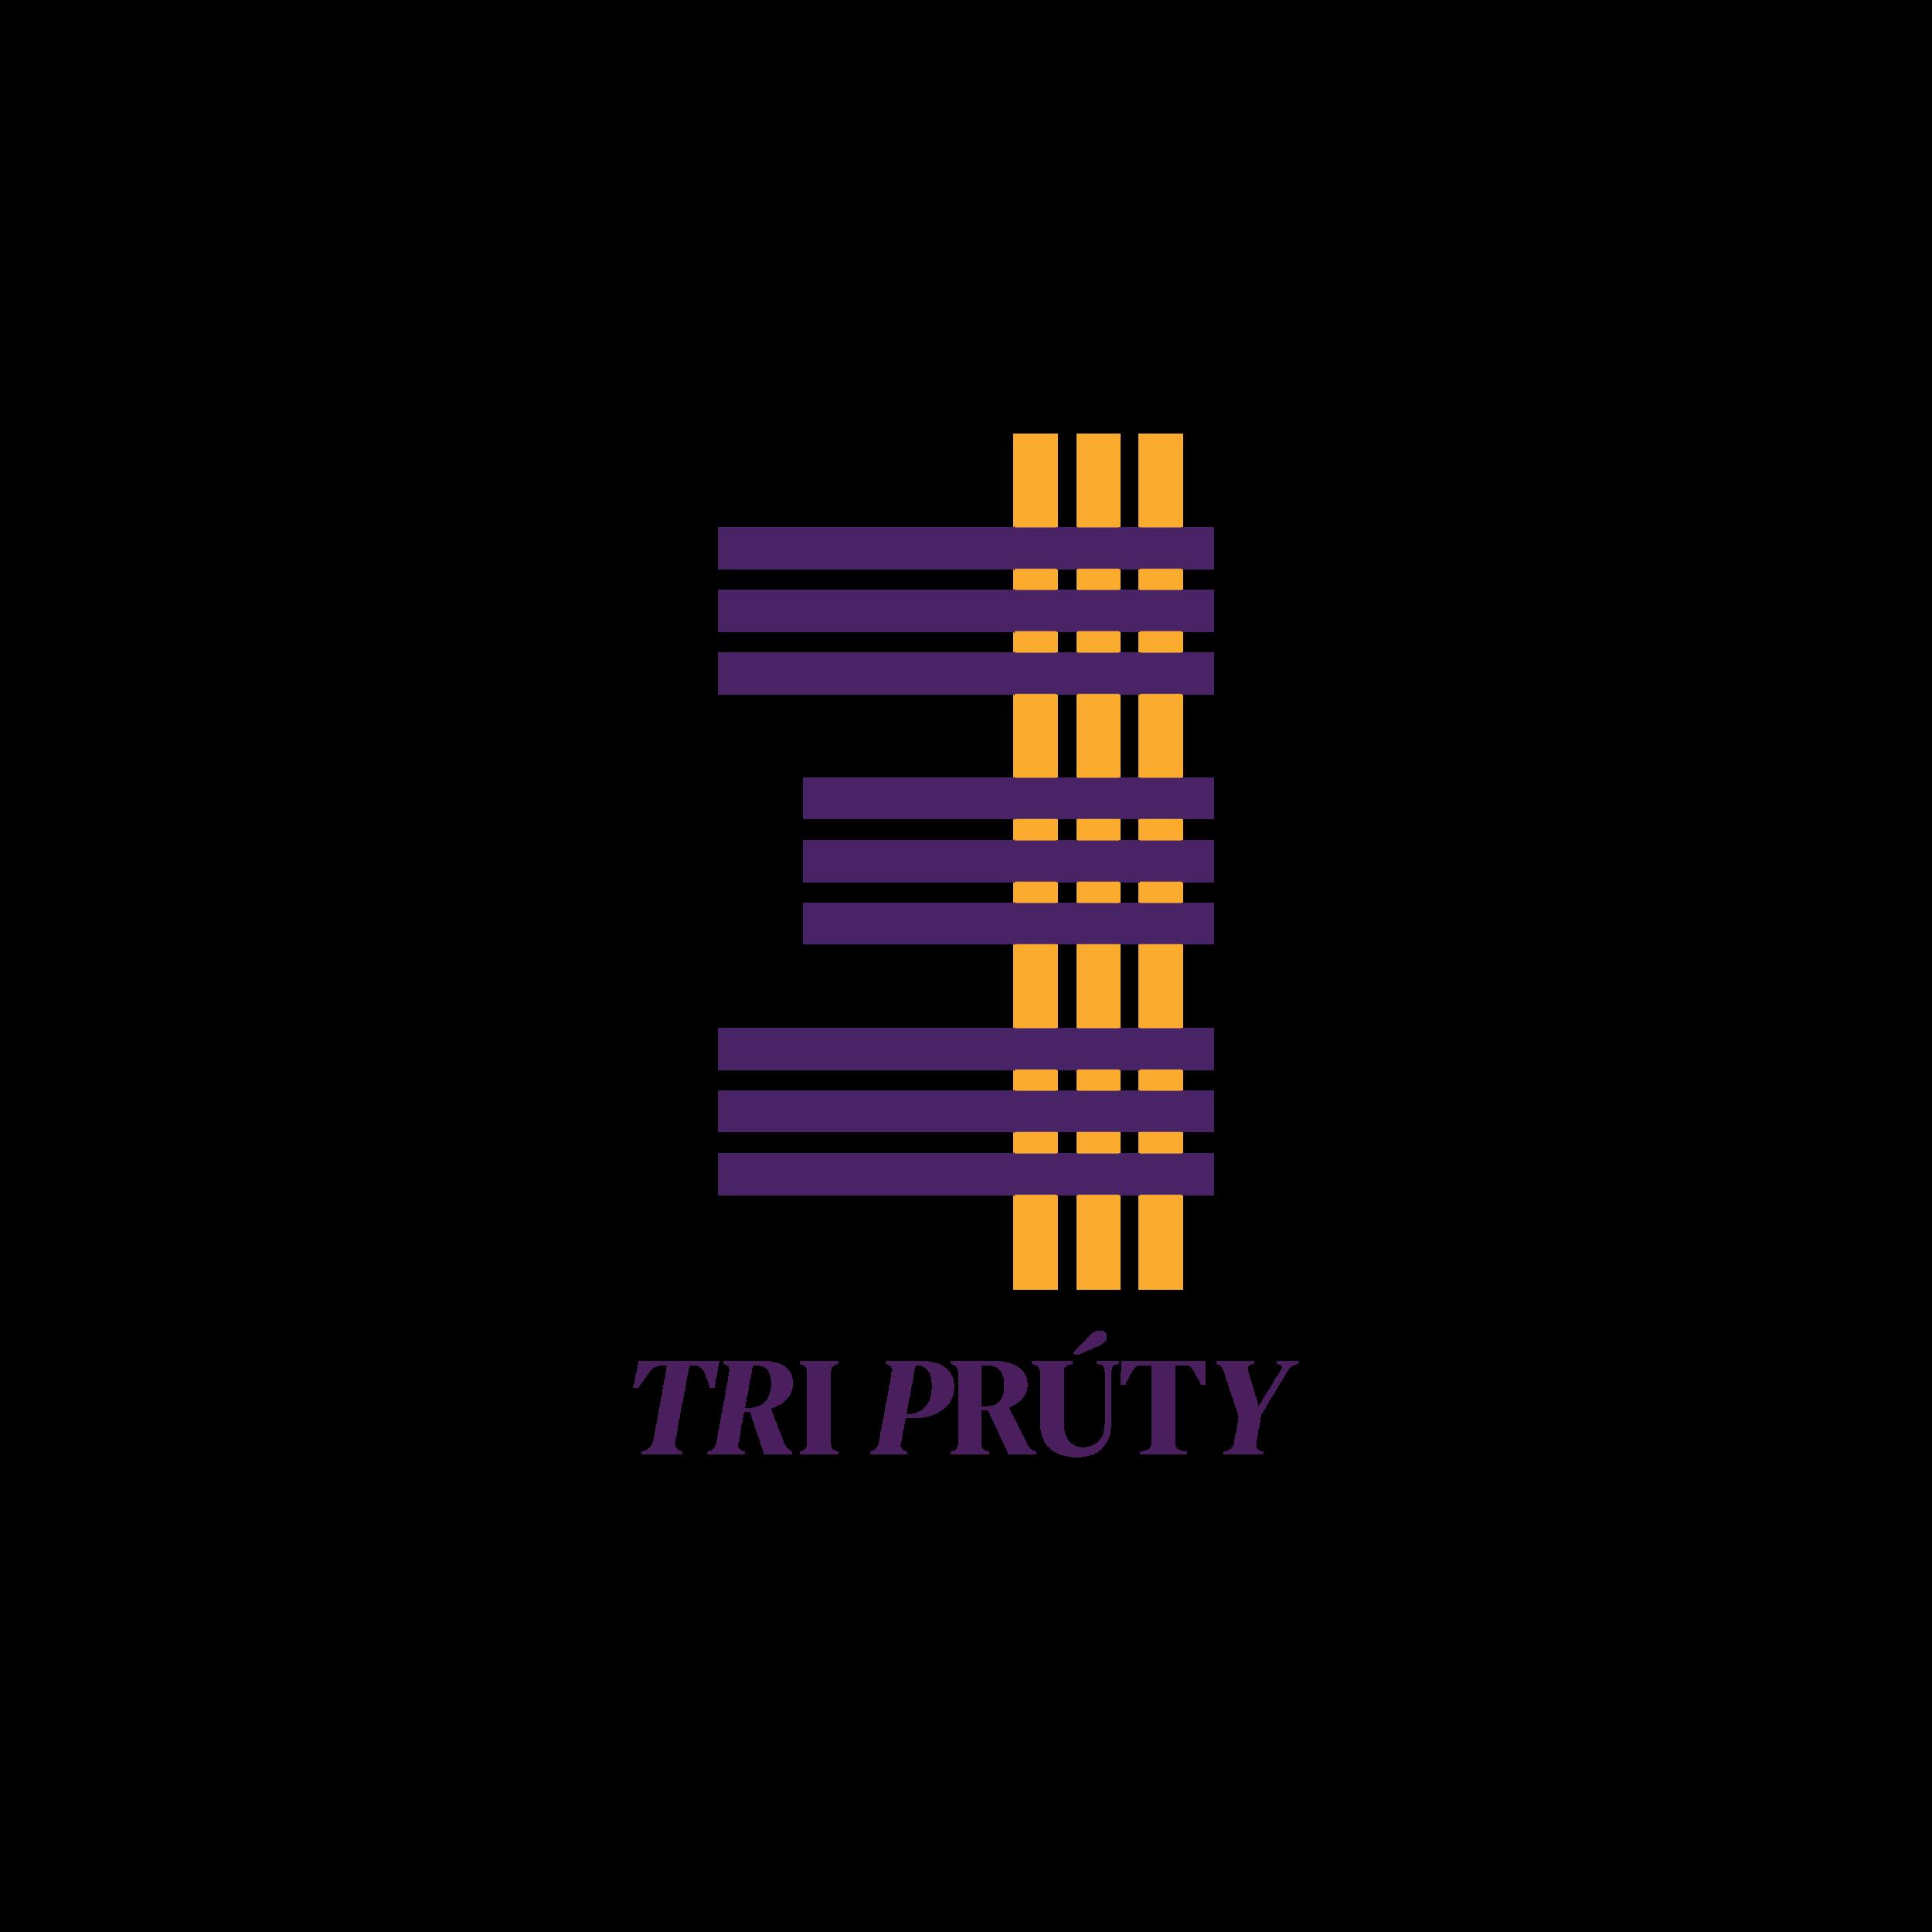 logo_pozitiv.png